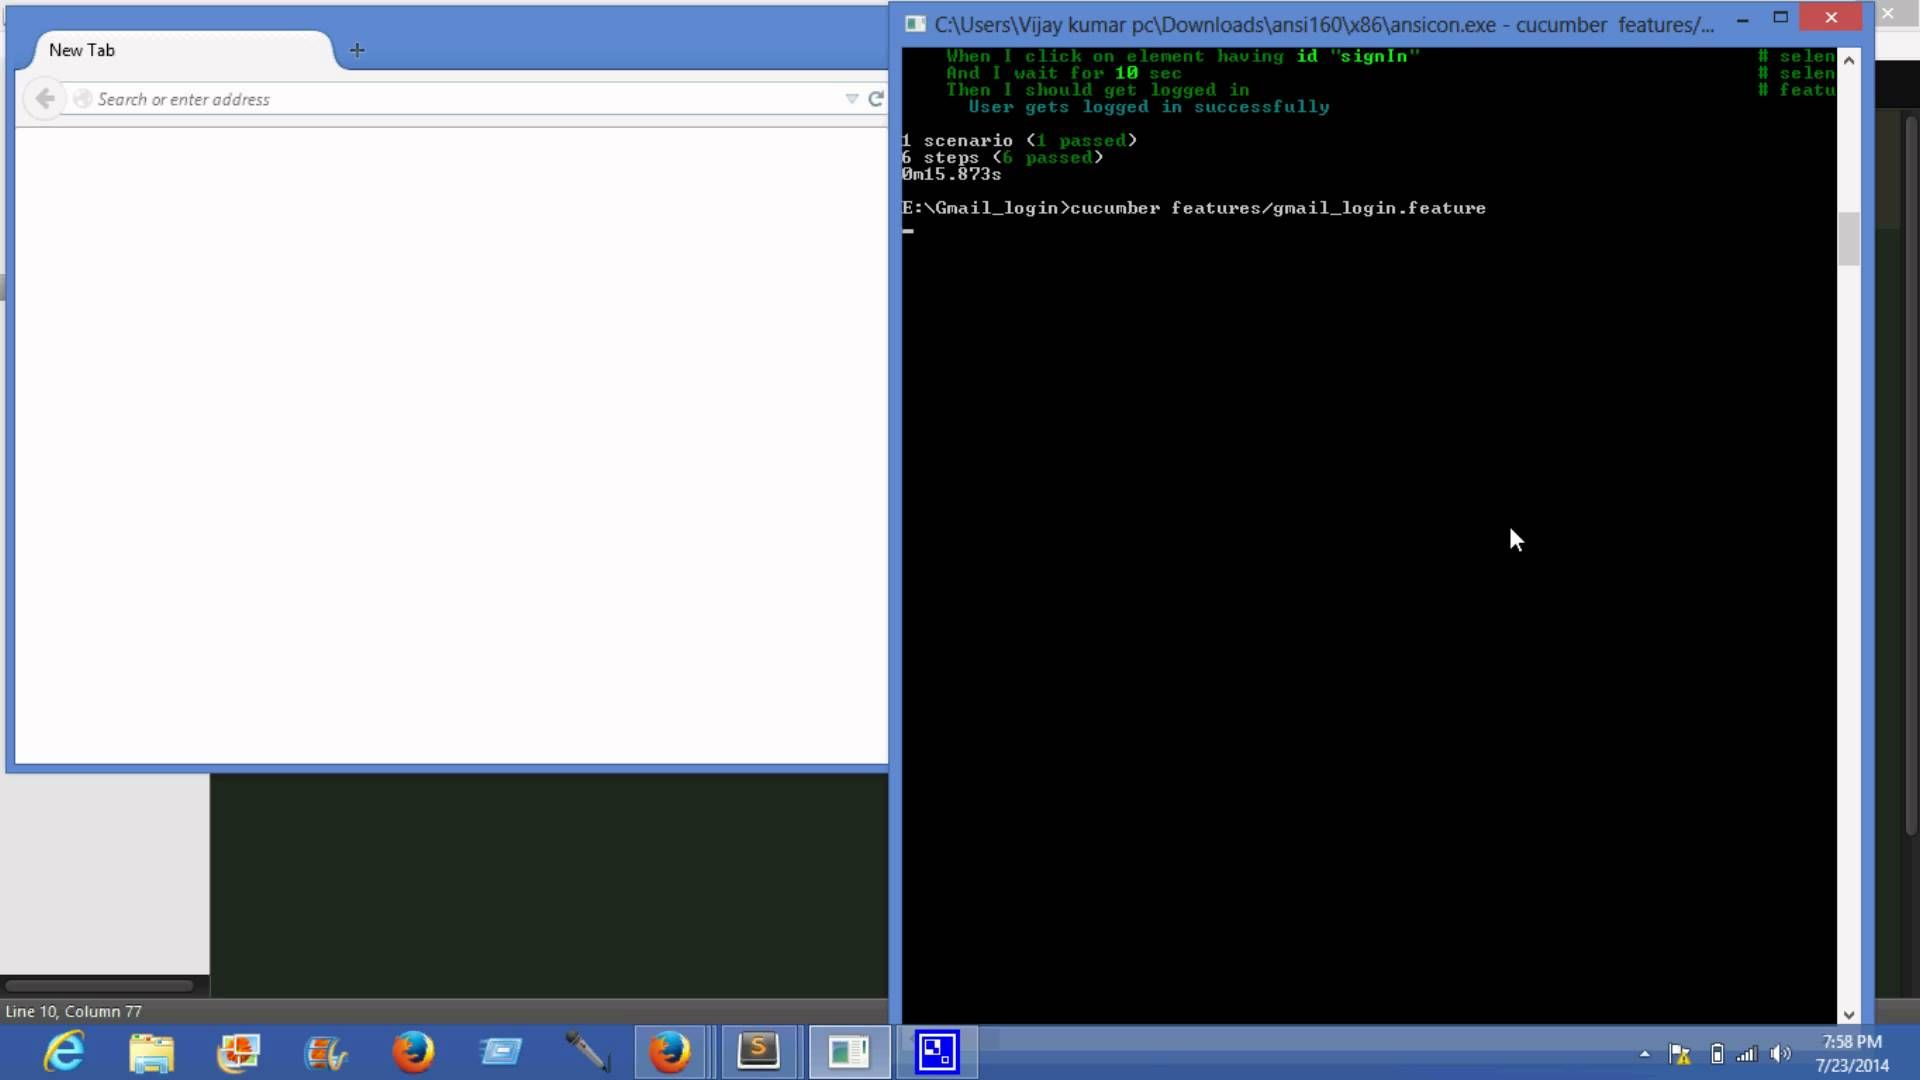 Gmail login page automation using selenium-cucumber | tech